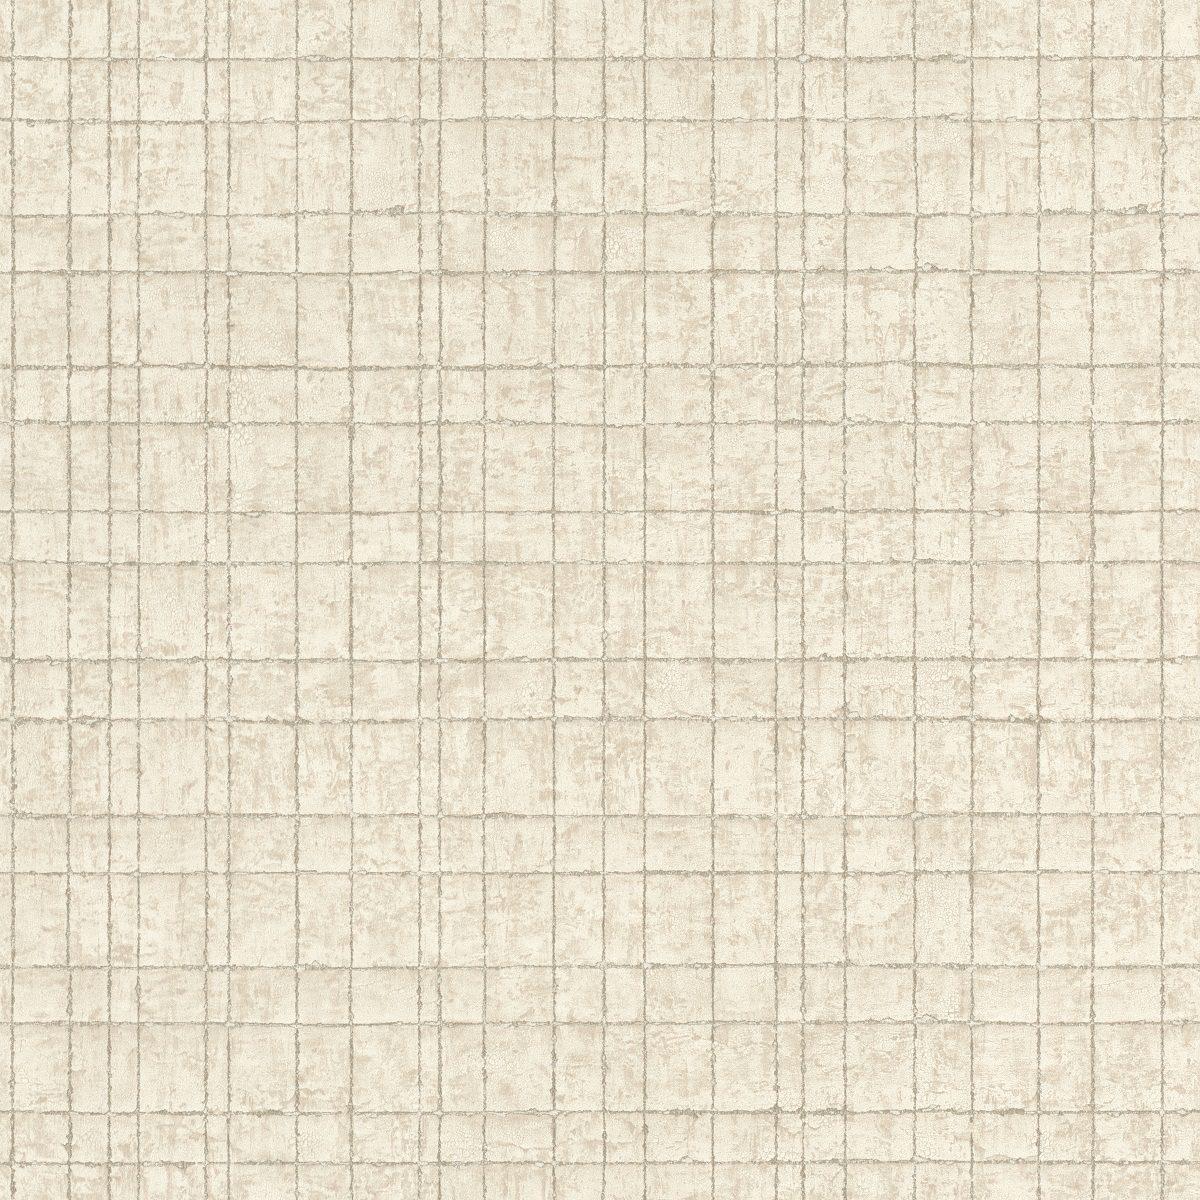 Papel mural geométrico beige y dorado KERALA 551303 RASCH